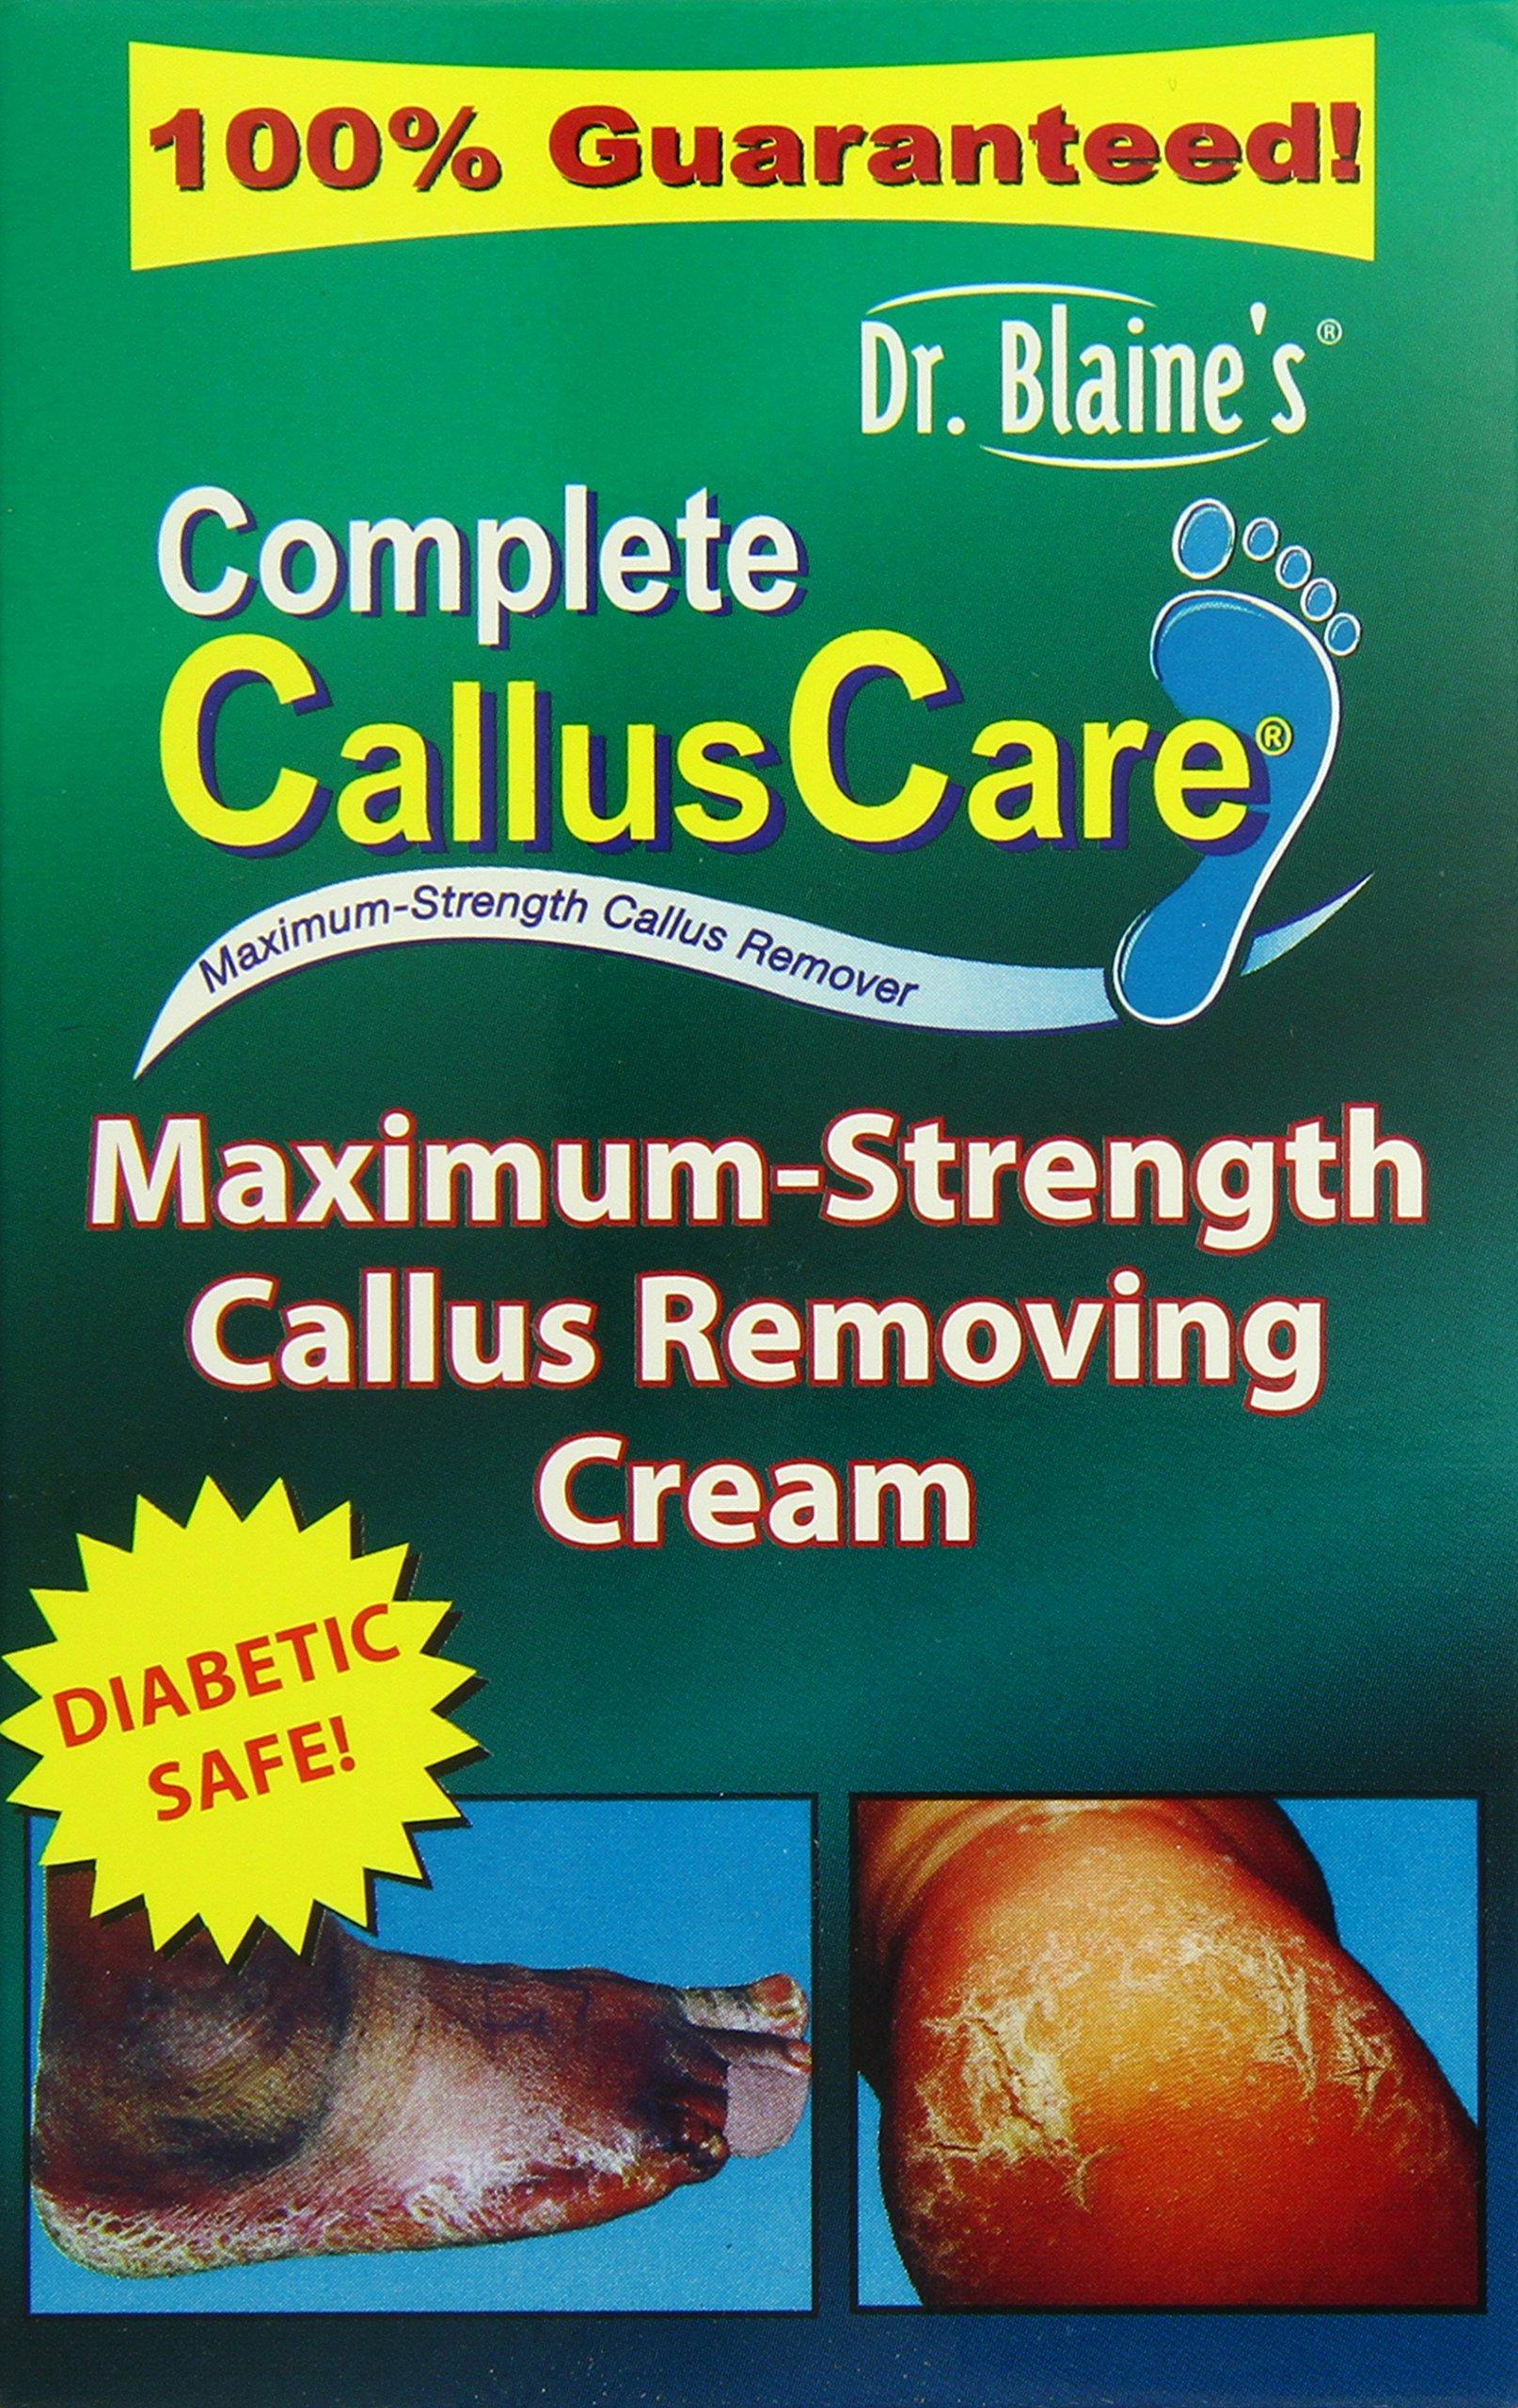 Dr. Blaine's Complete CallusCare Kit